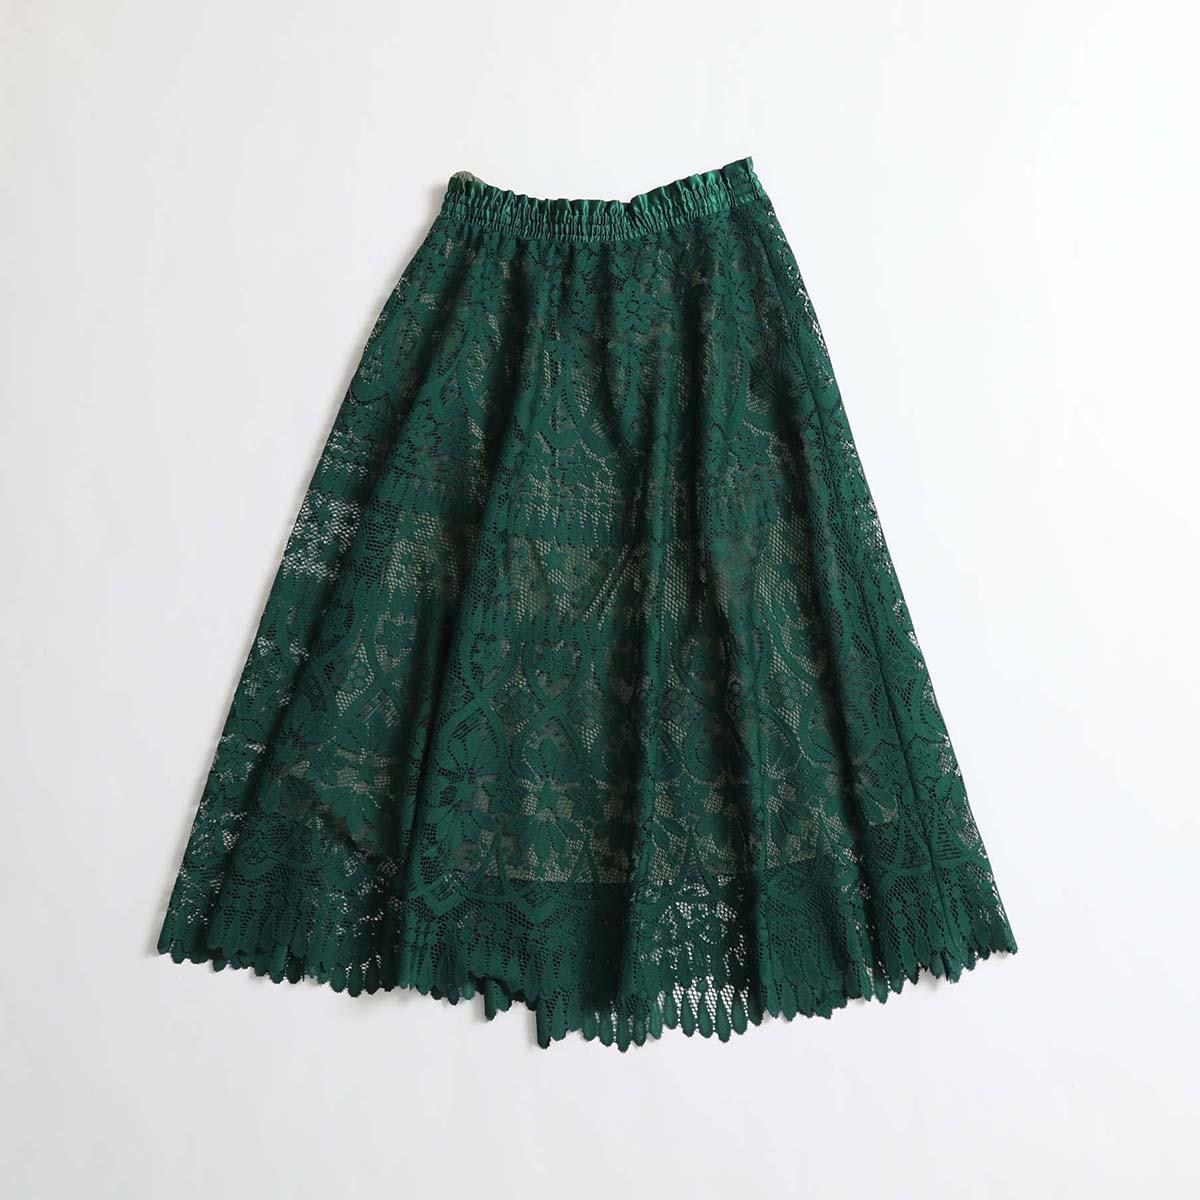 『HYERES LACE 』 Circular skirt GREEN×KHAKI画像